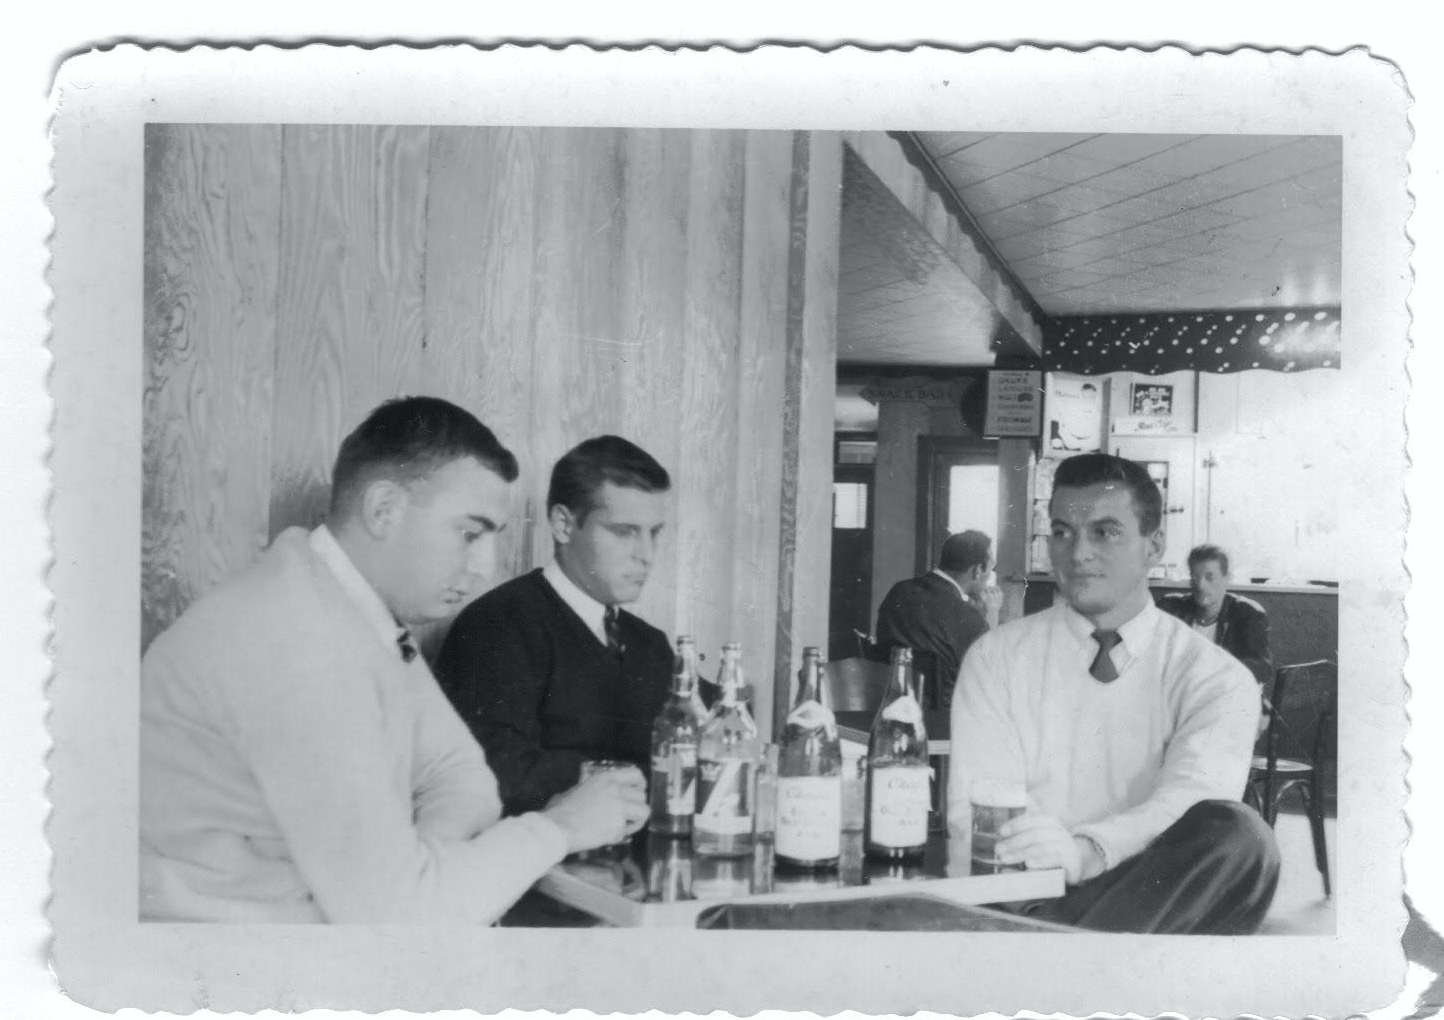 Three Deek brothers enjoying 1955 Spring Break: Emmett Williams (President 1955-56), Tom Aud, and Charles O'Brien (President 1954-55)